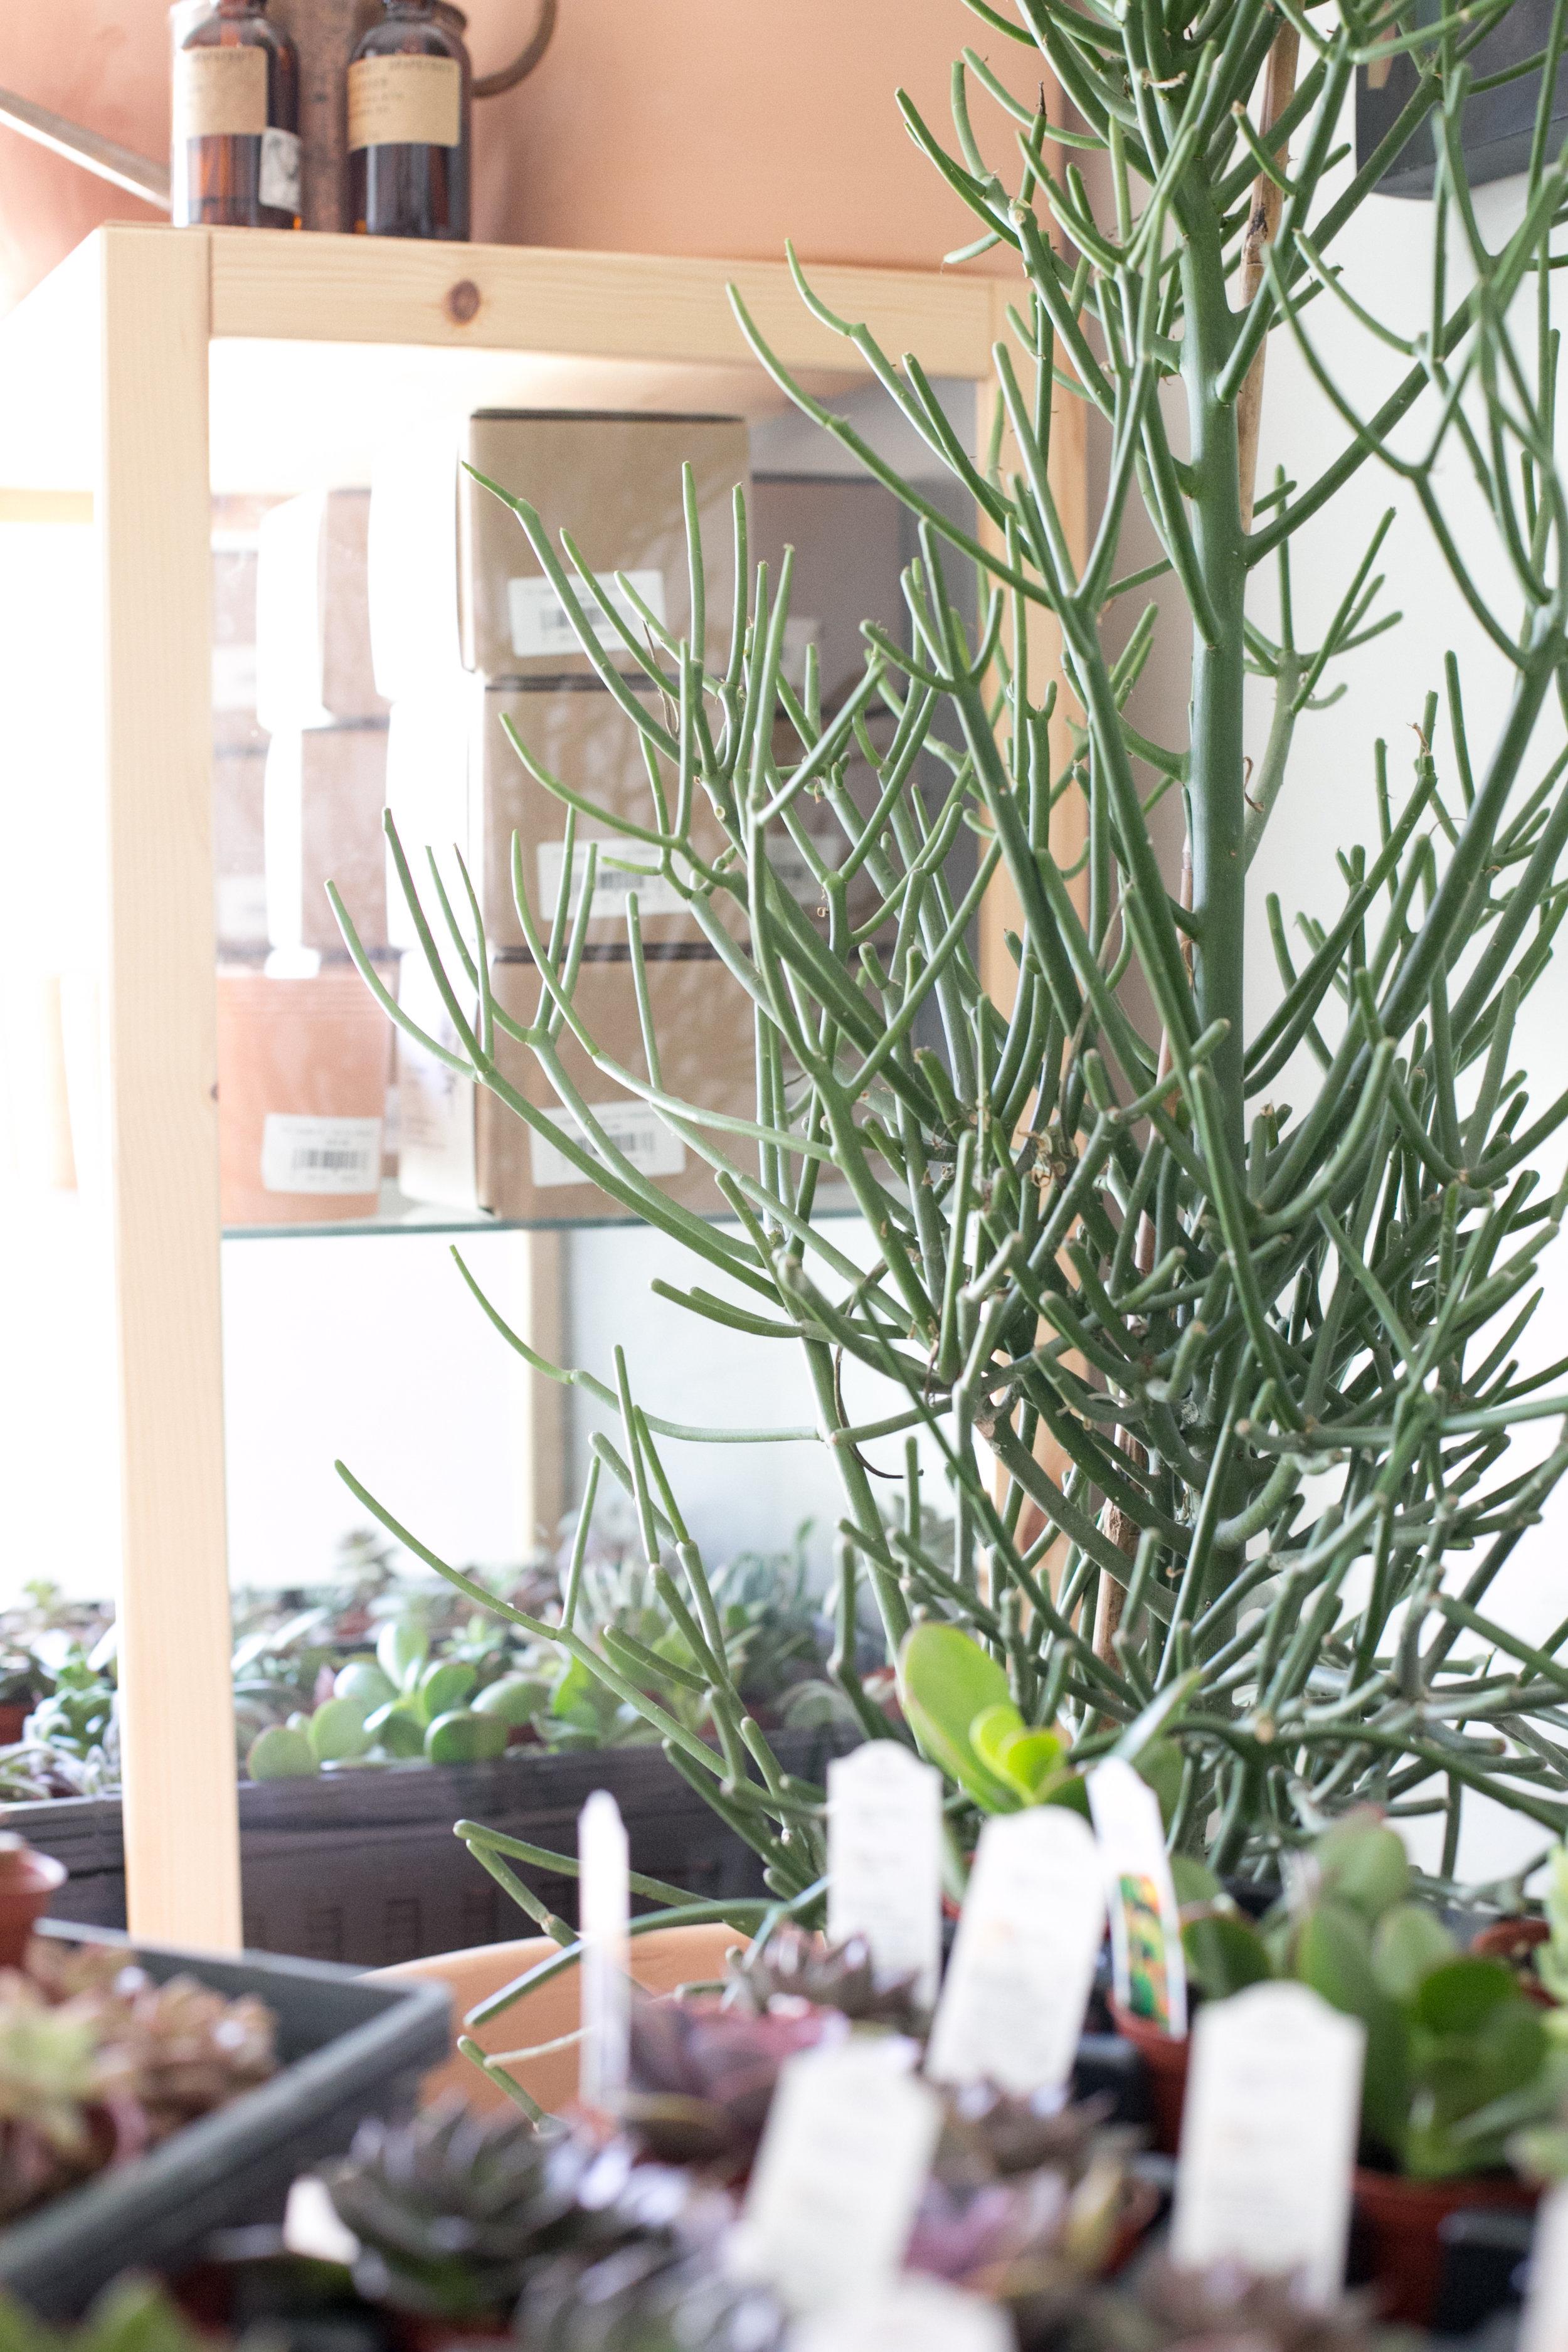 Succulents like this Pencil Cactus ( Euphorbia tirucalli ) do well in full sun.